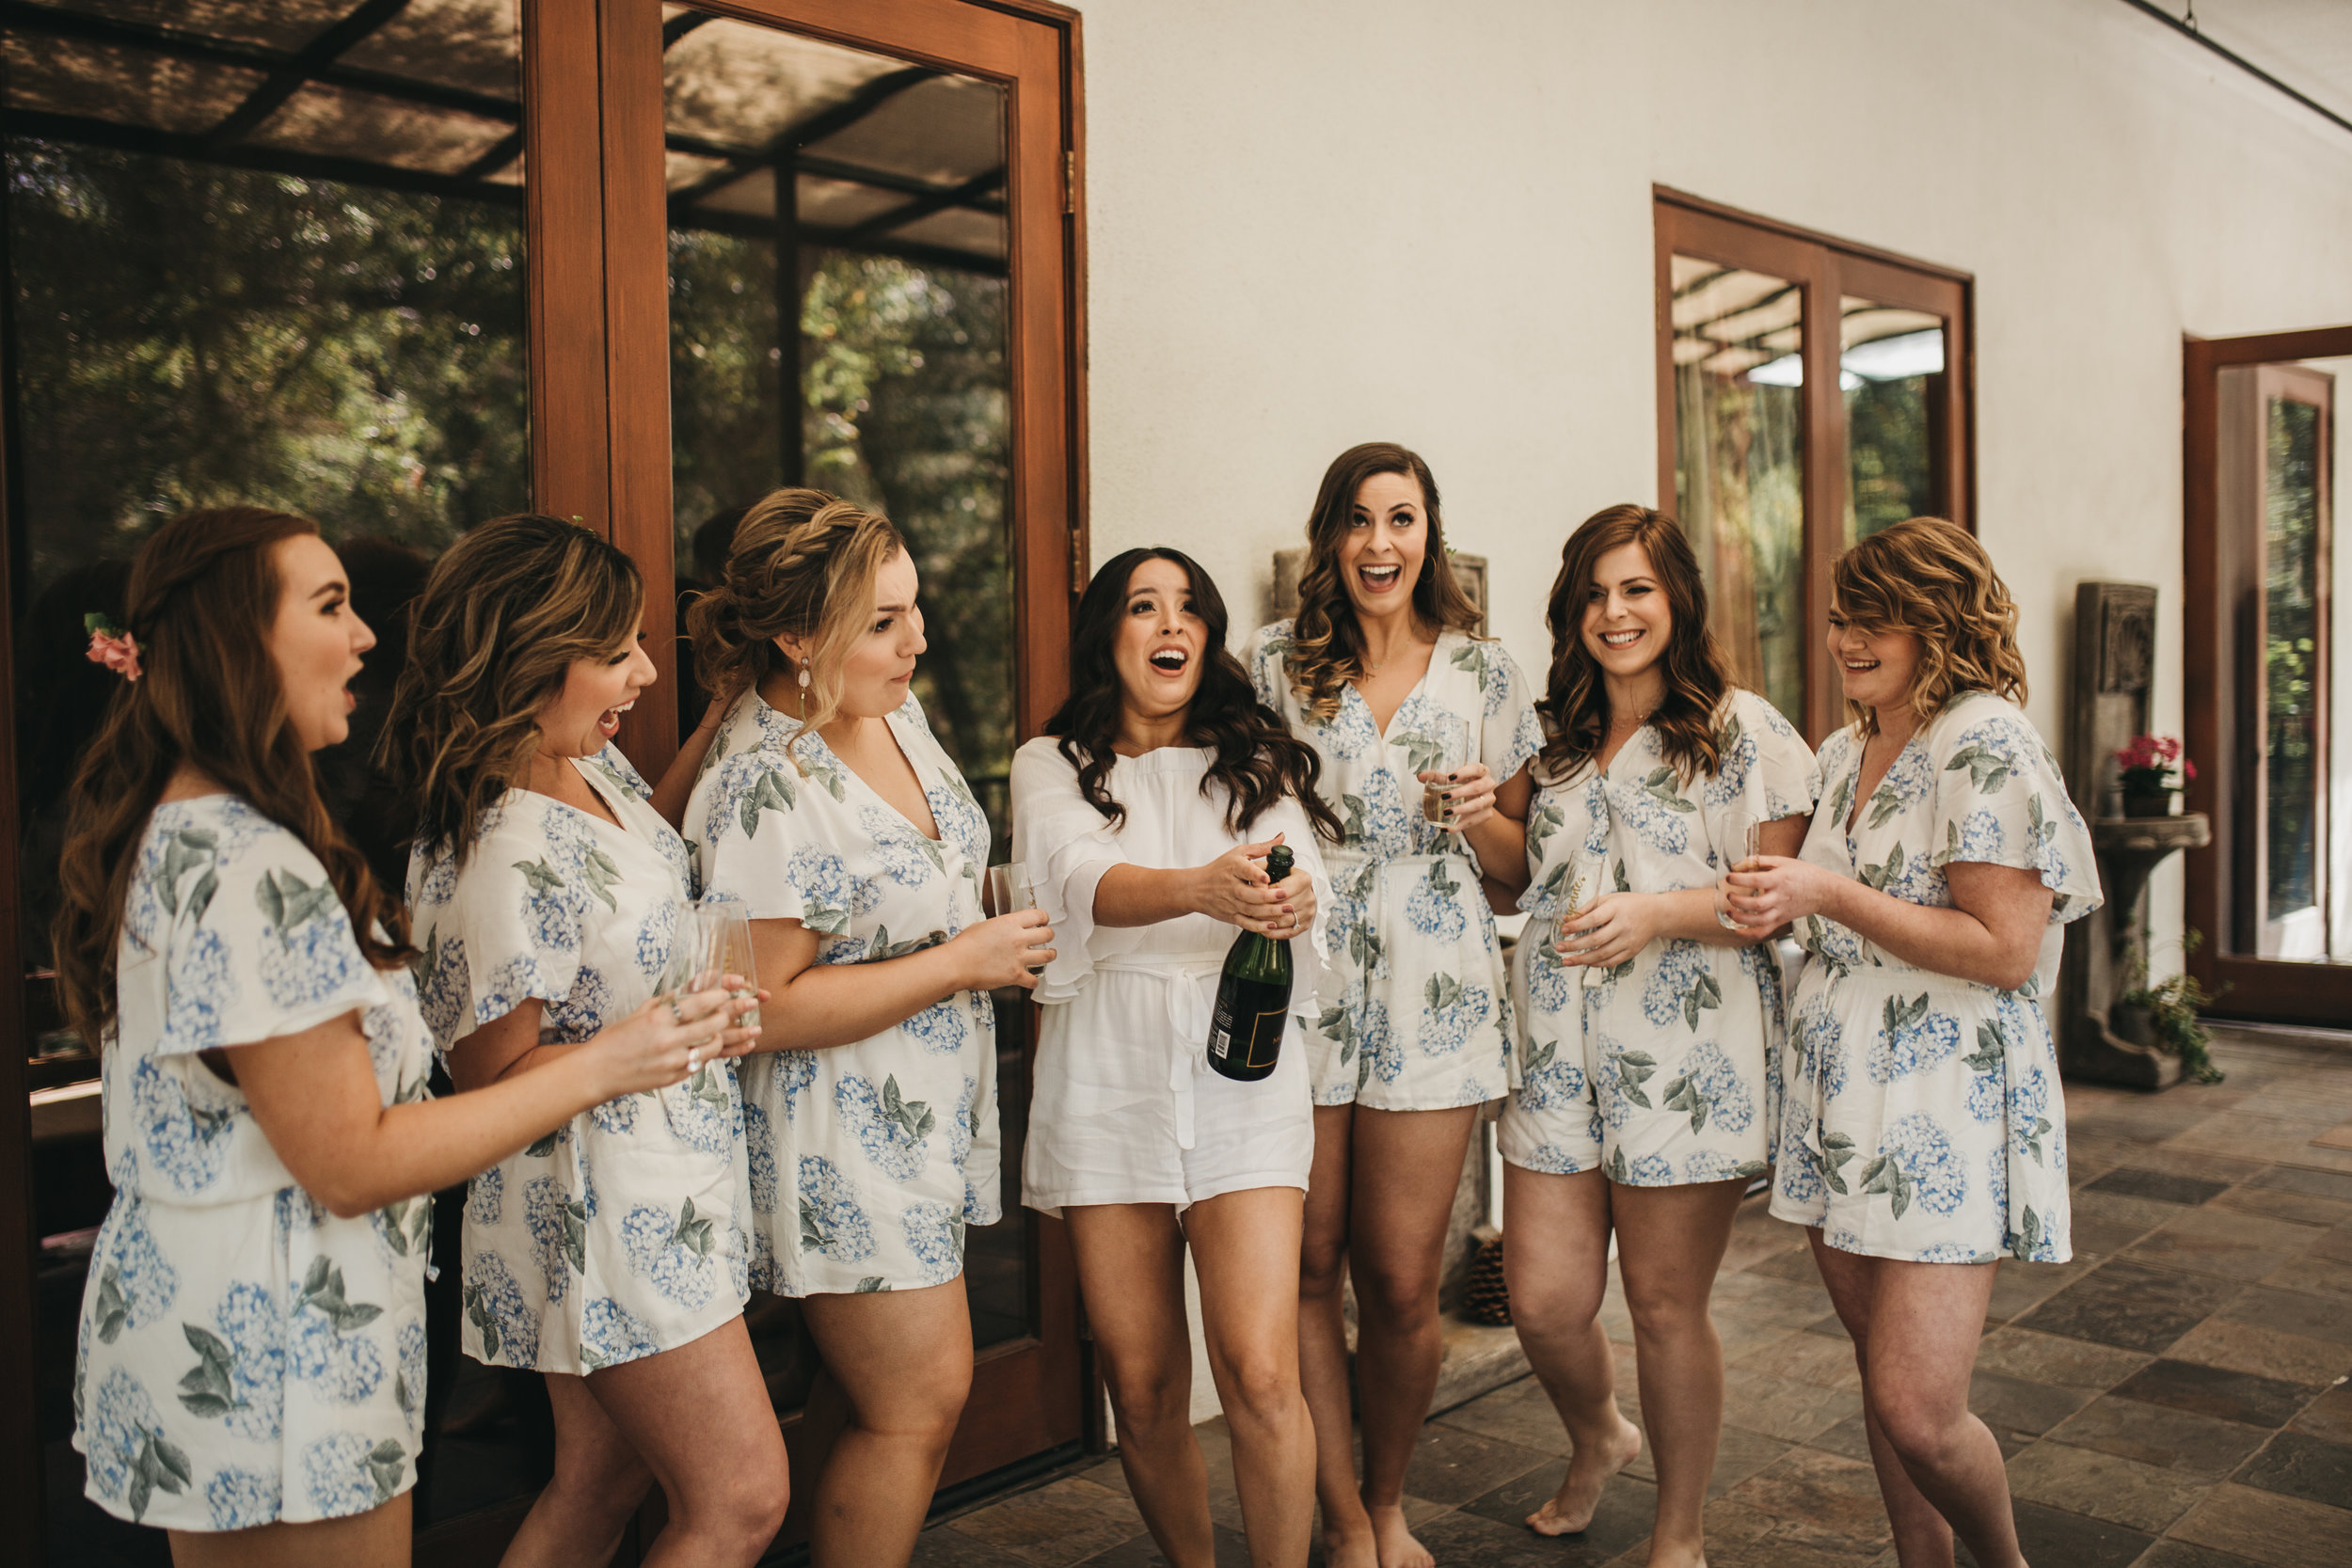 The 1909, The 1909 Wedding, Topanga Canyon Wedding, bridal party champagne, pop the champagne, bridal party getting ready photos